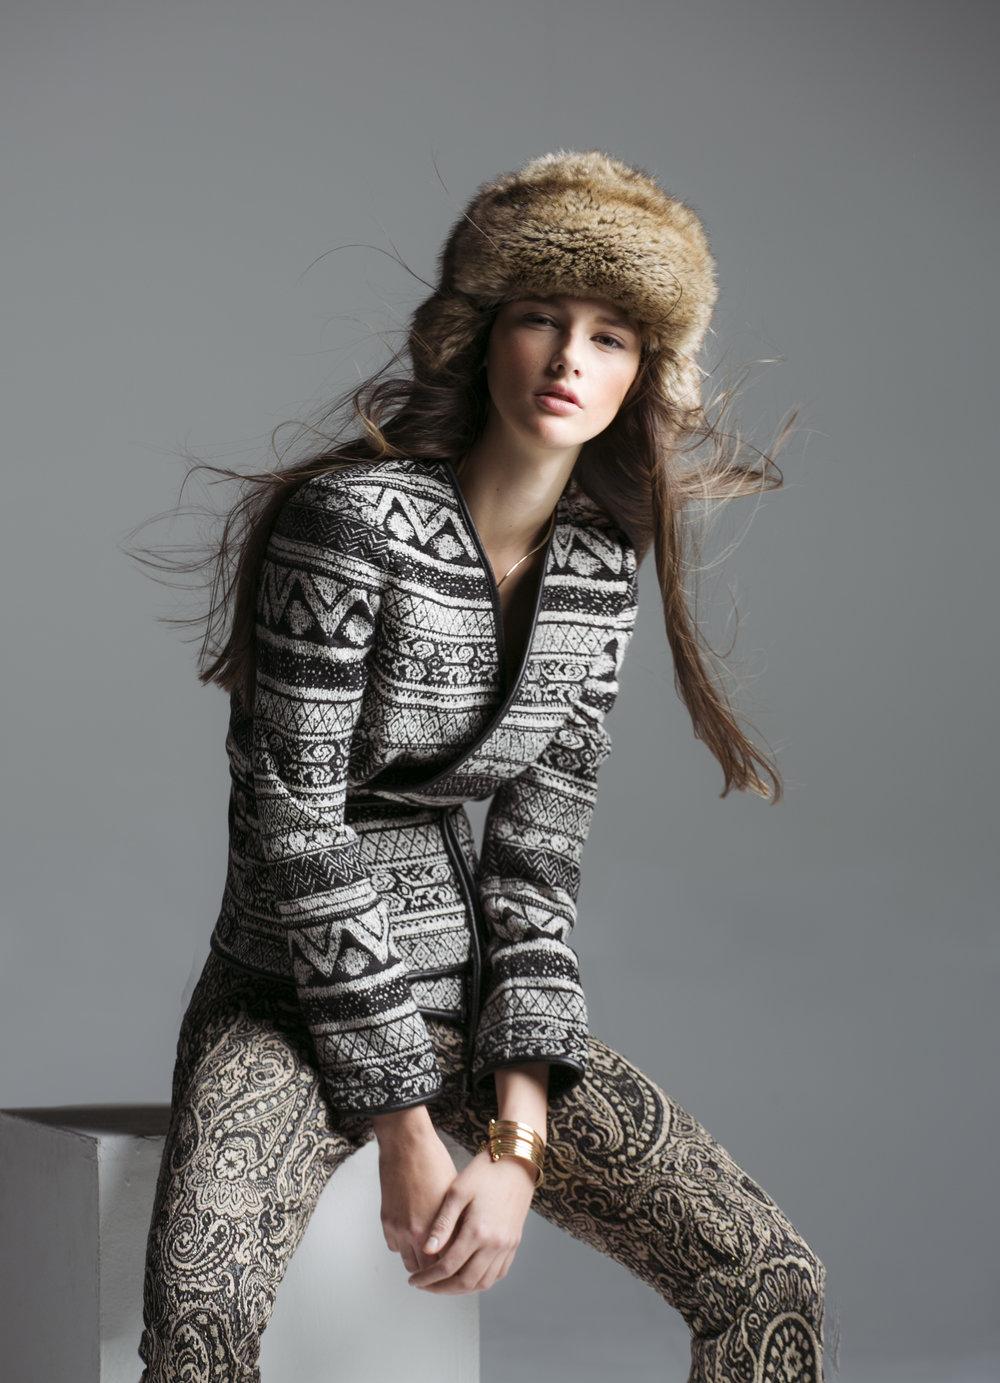 rachel fur IG.jpg